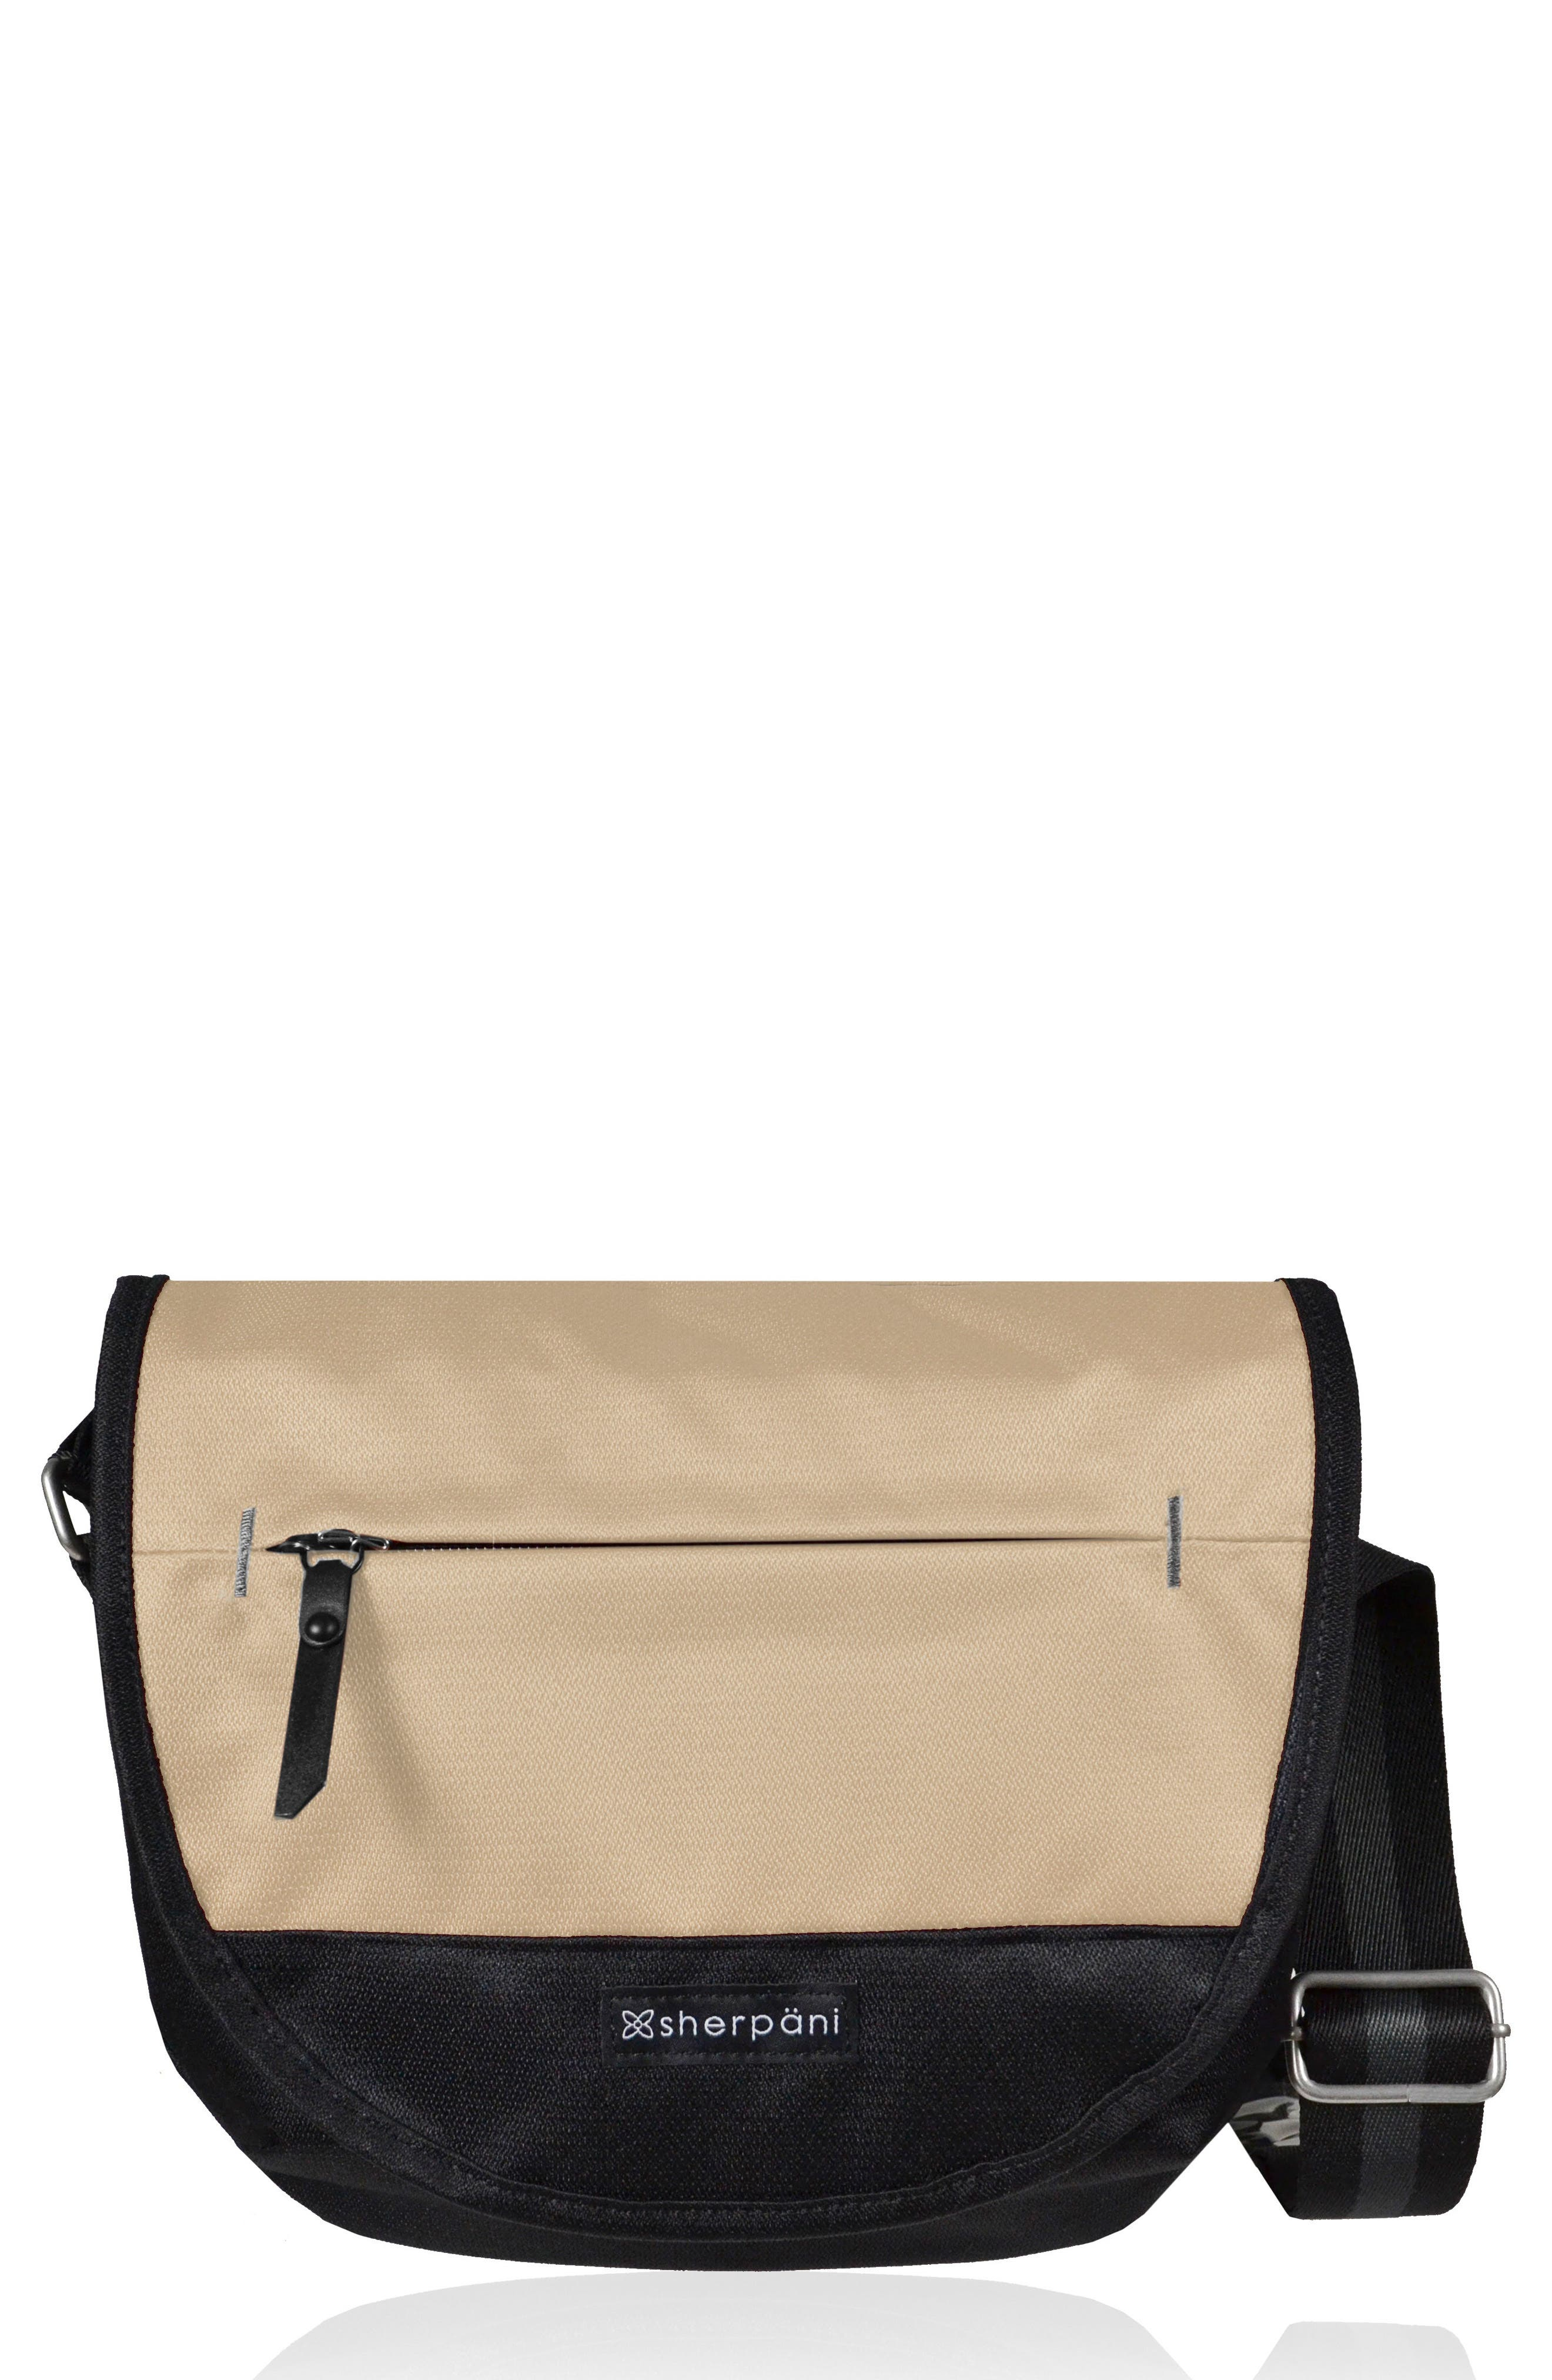 Main Image - Sherpani Milli Water Resistant RFID Picket Messenger Bag